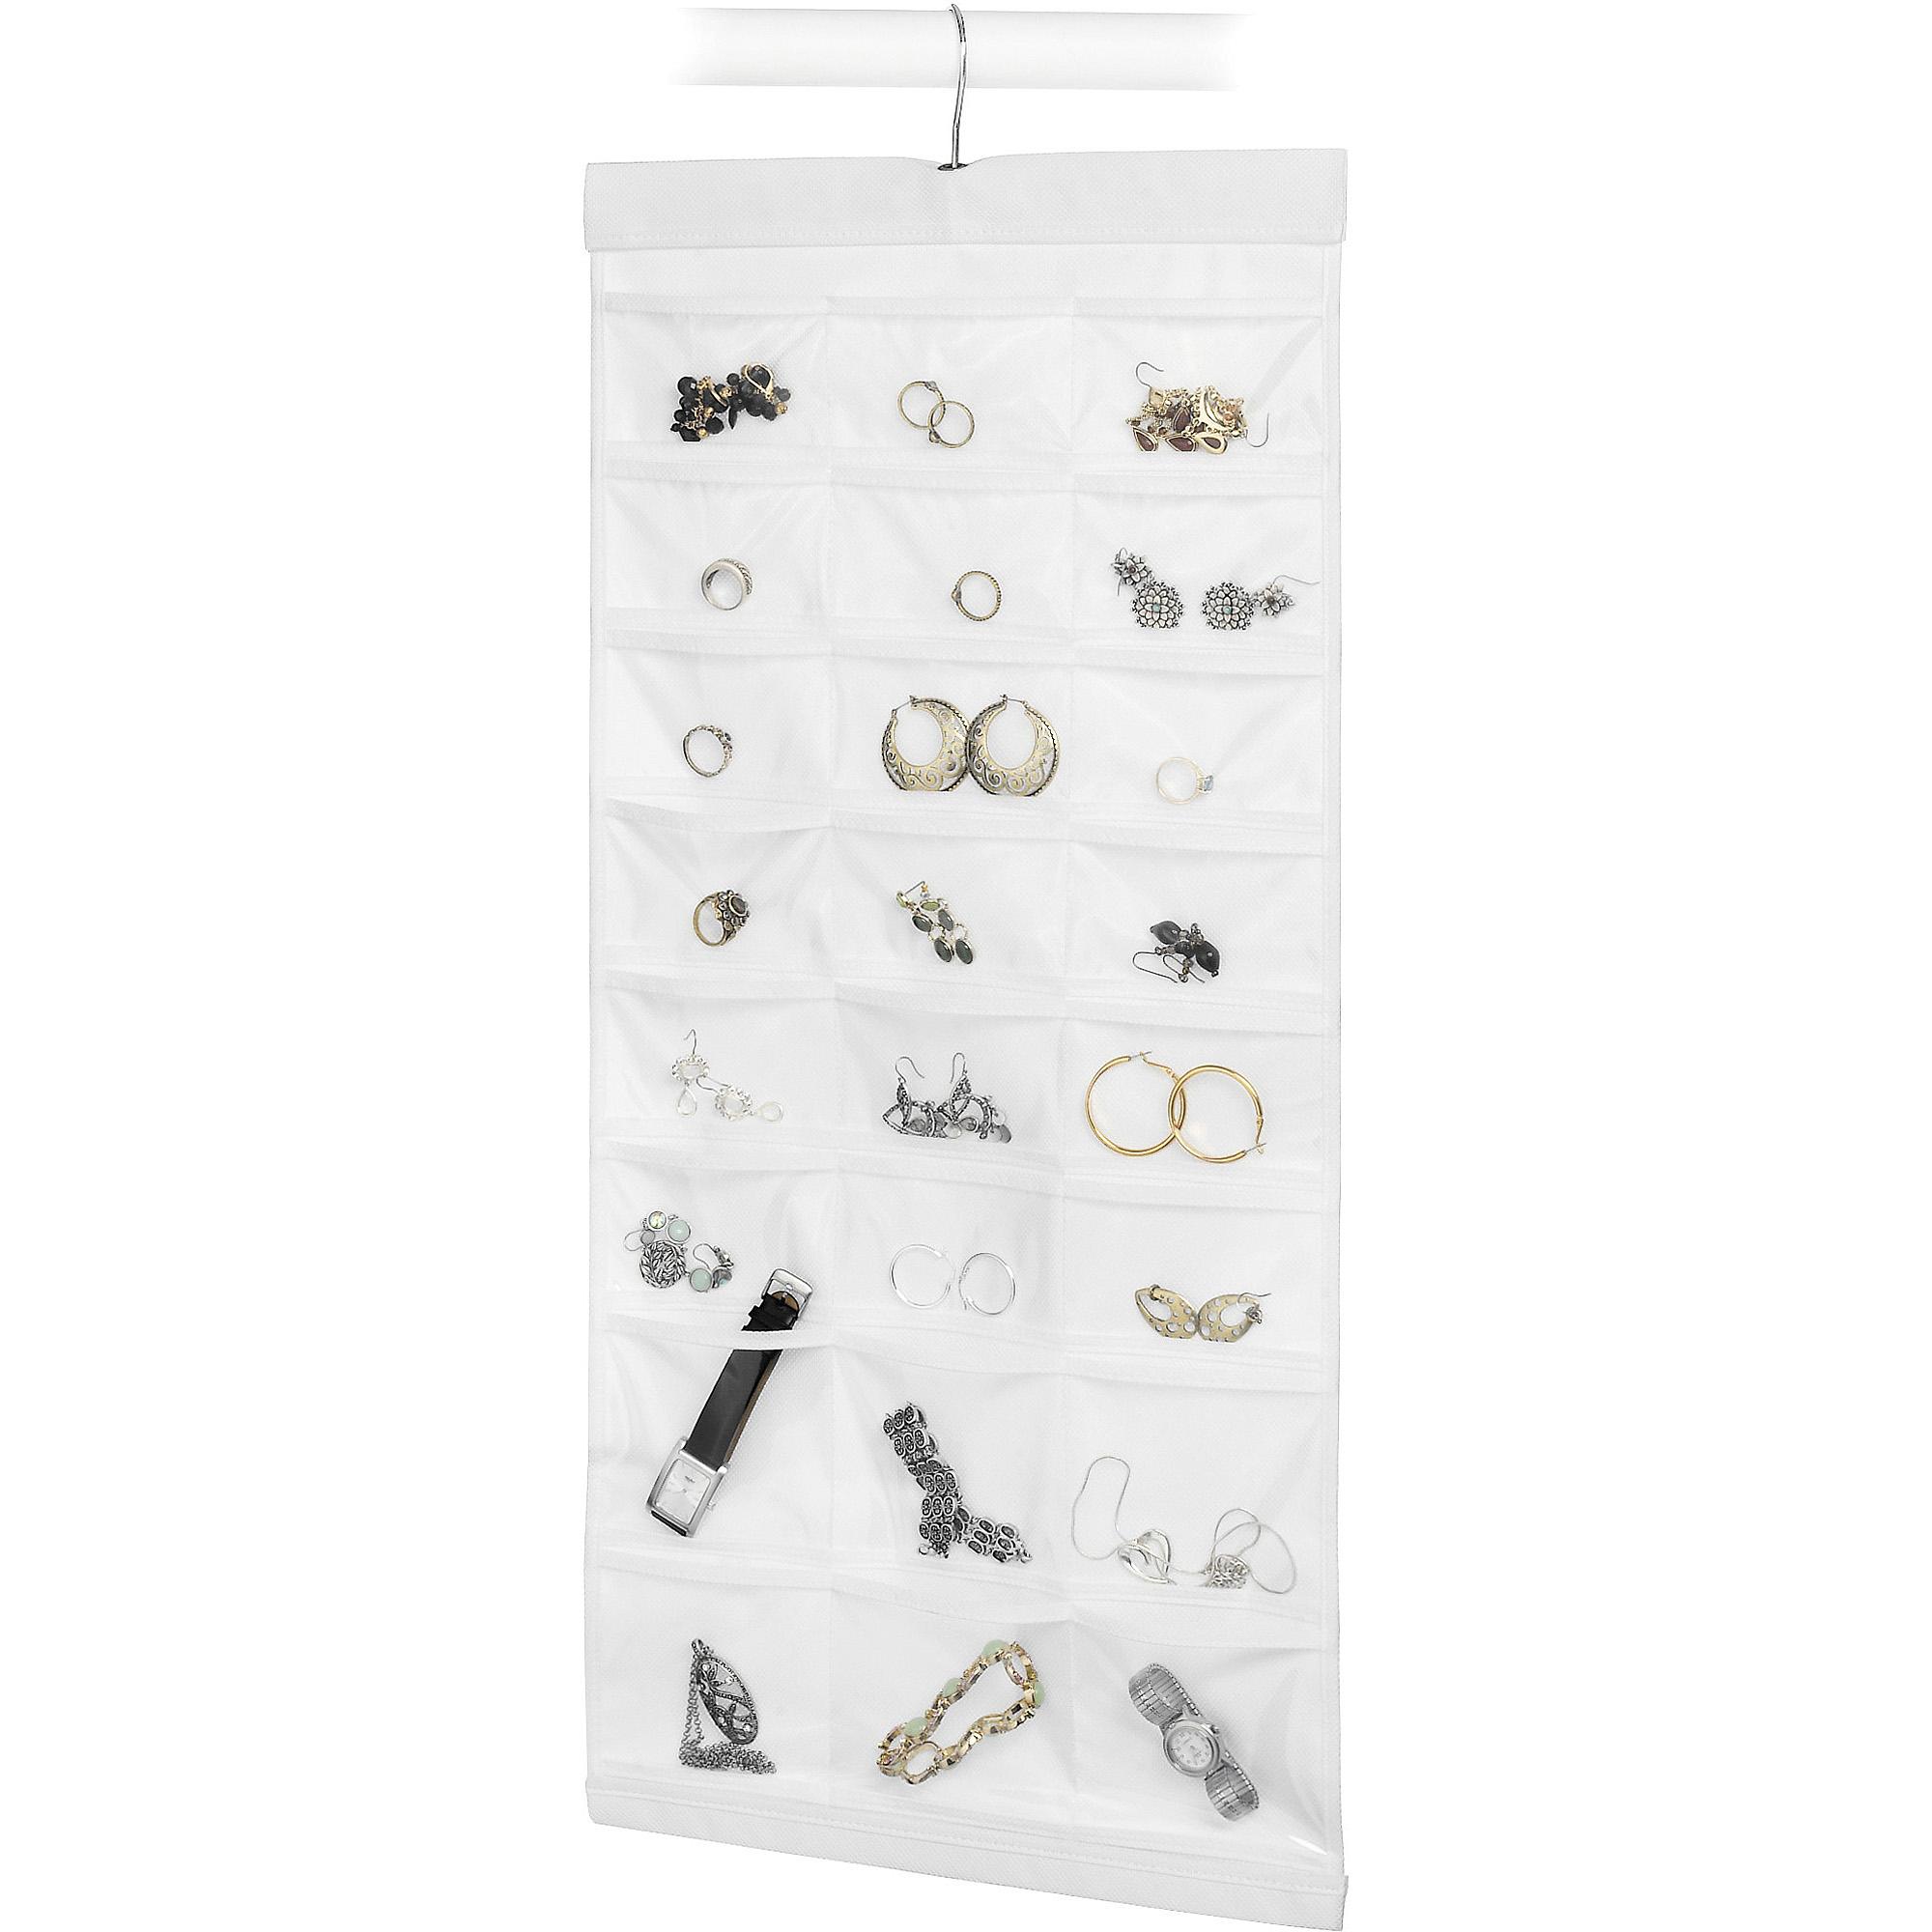 Whitmor White Hanging Jewelry File